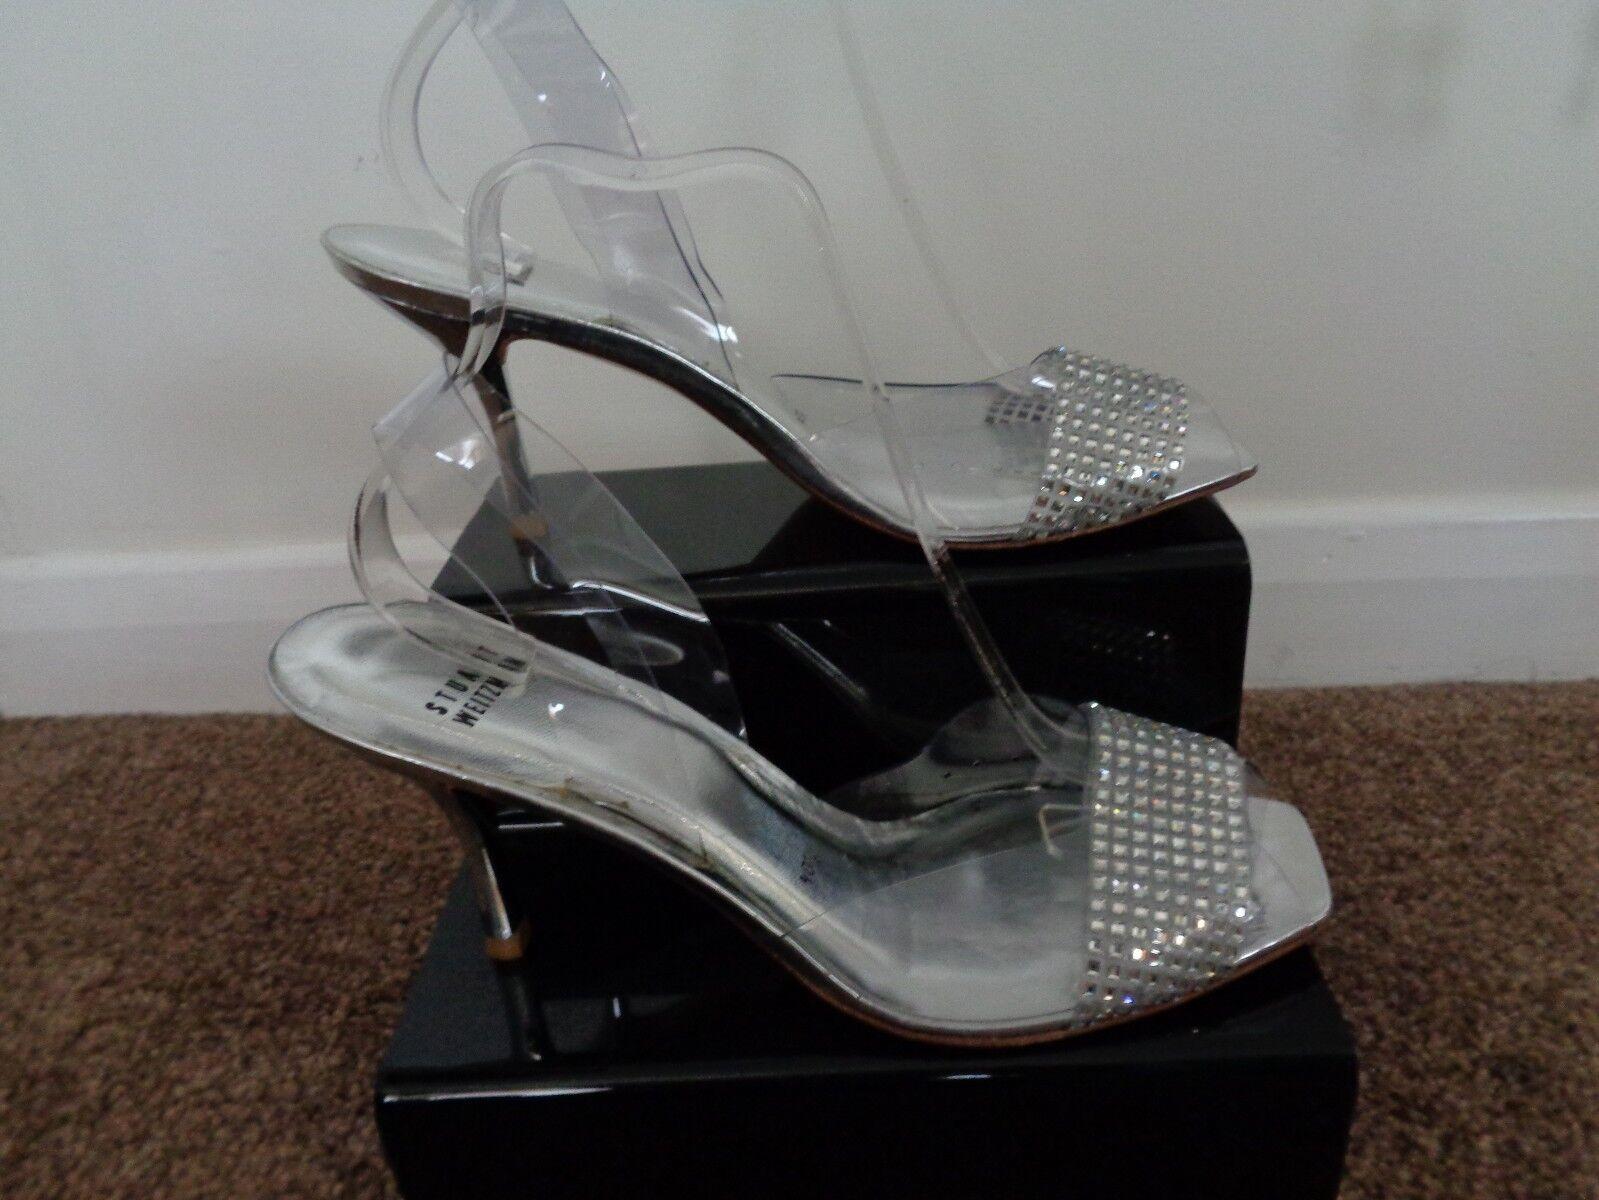 NUOVA & STUPENDA STUART WEITZMAN 7.5 sandali e diamante misura 7.5 WEITZMAN 1c146a